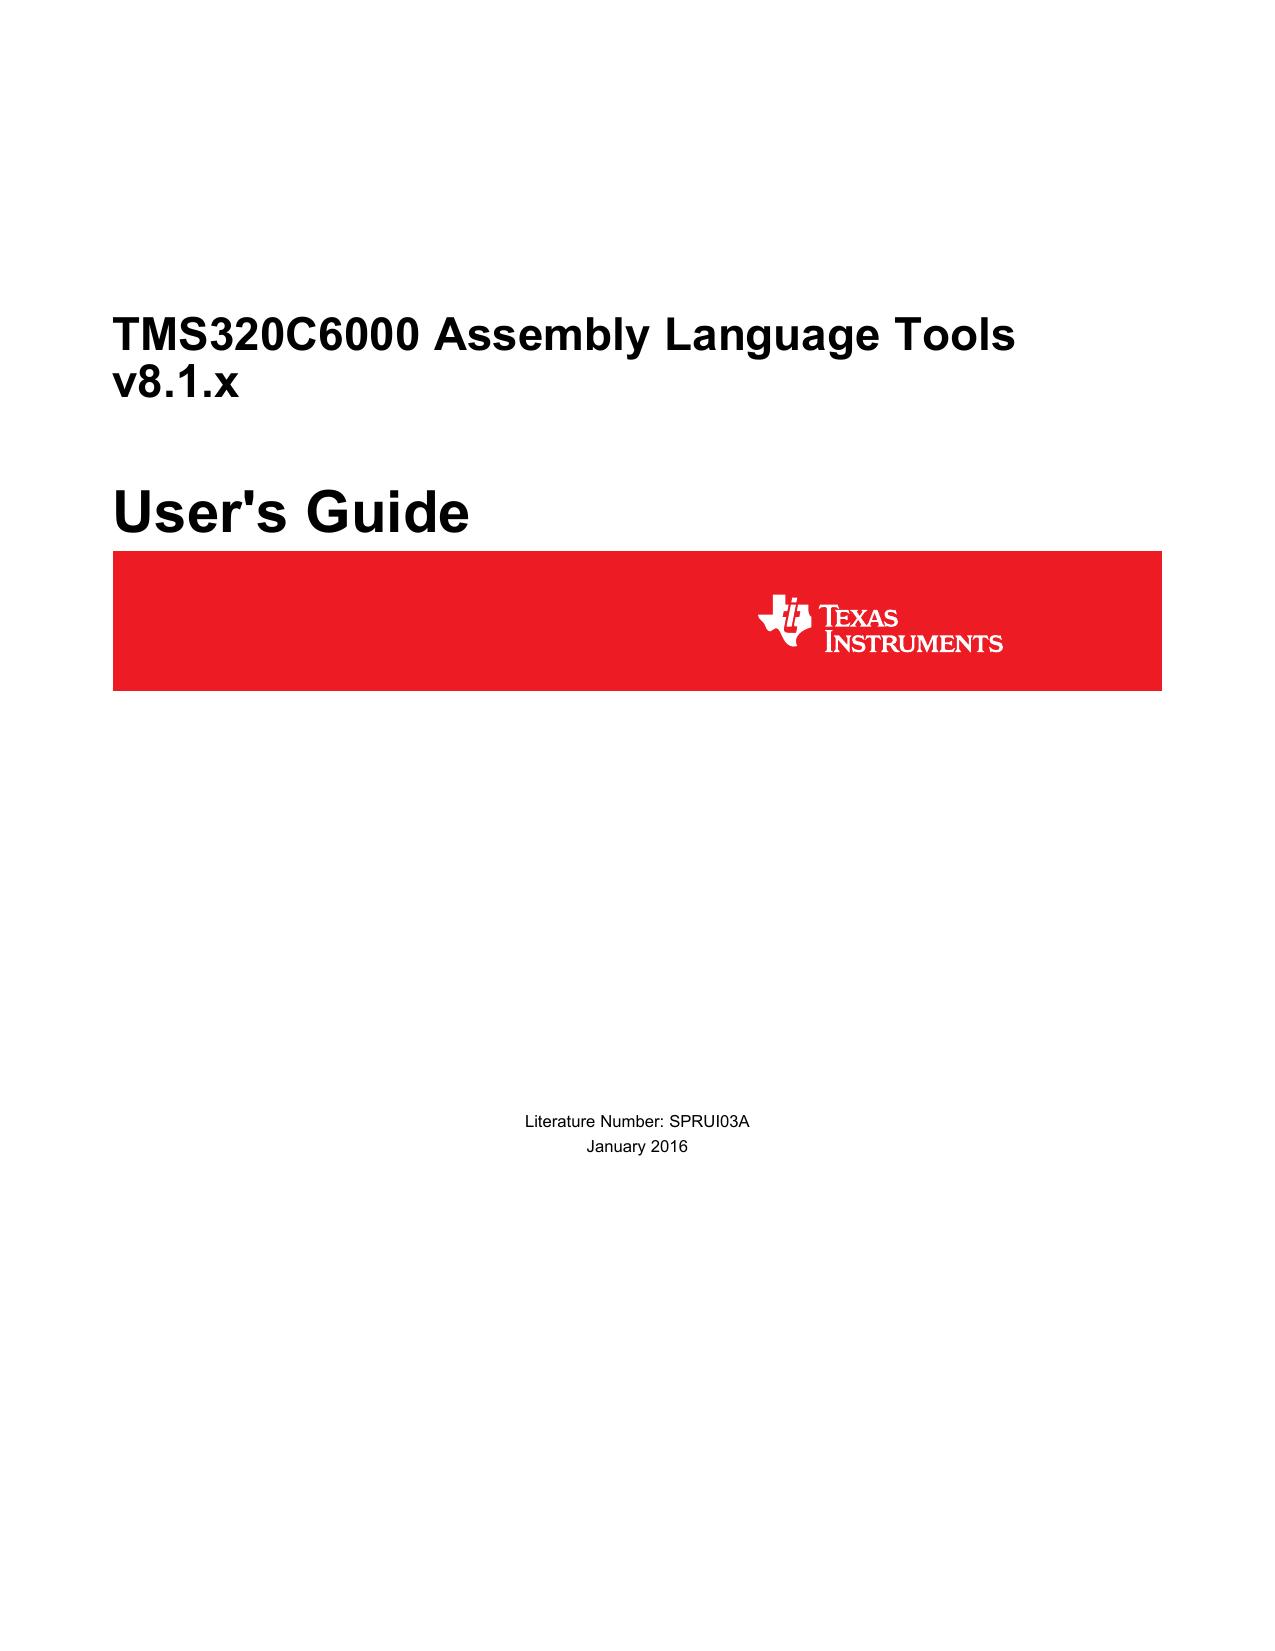 tms320c6000 assembly language tools v8 2 manualzz comtms320c6000 assembly language tools v8 2